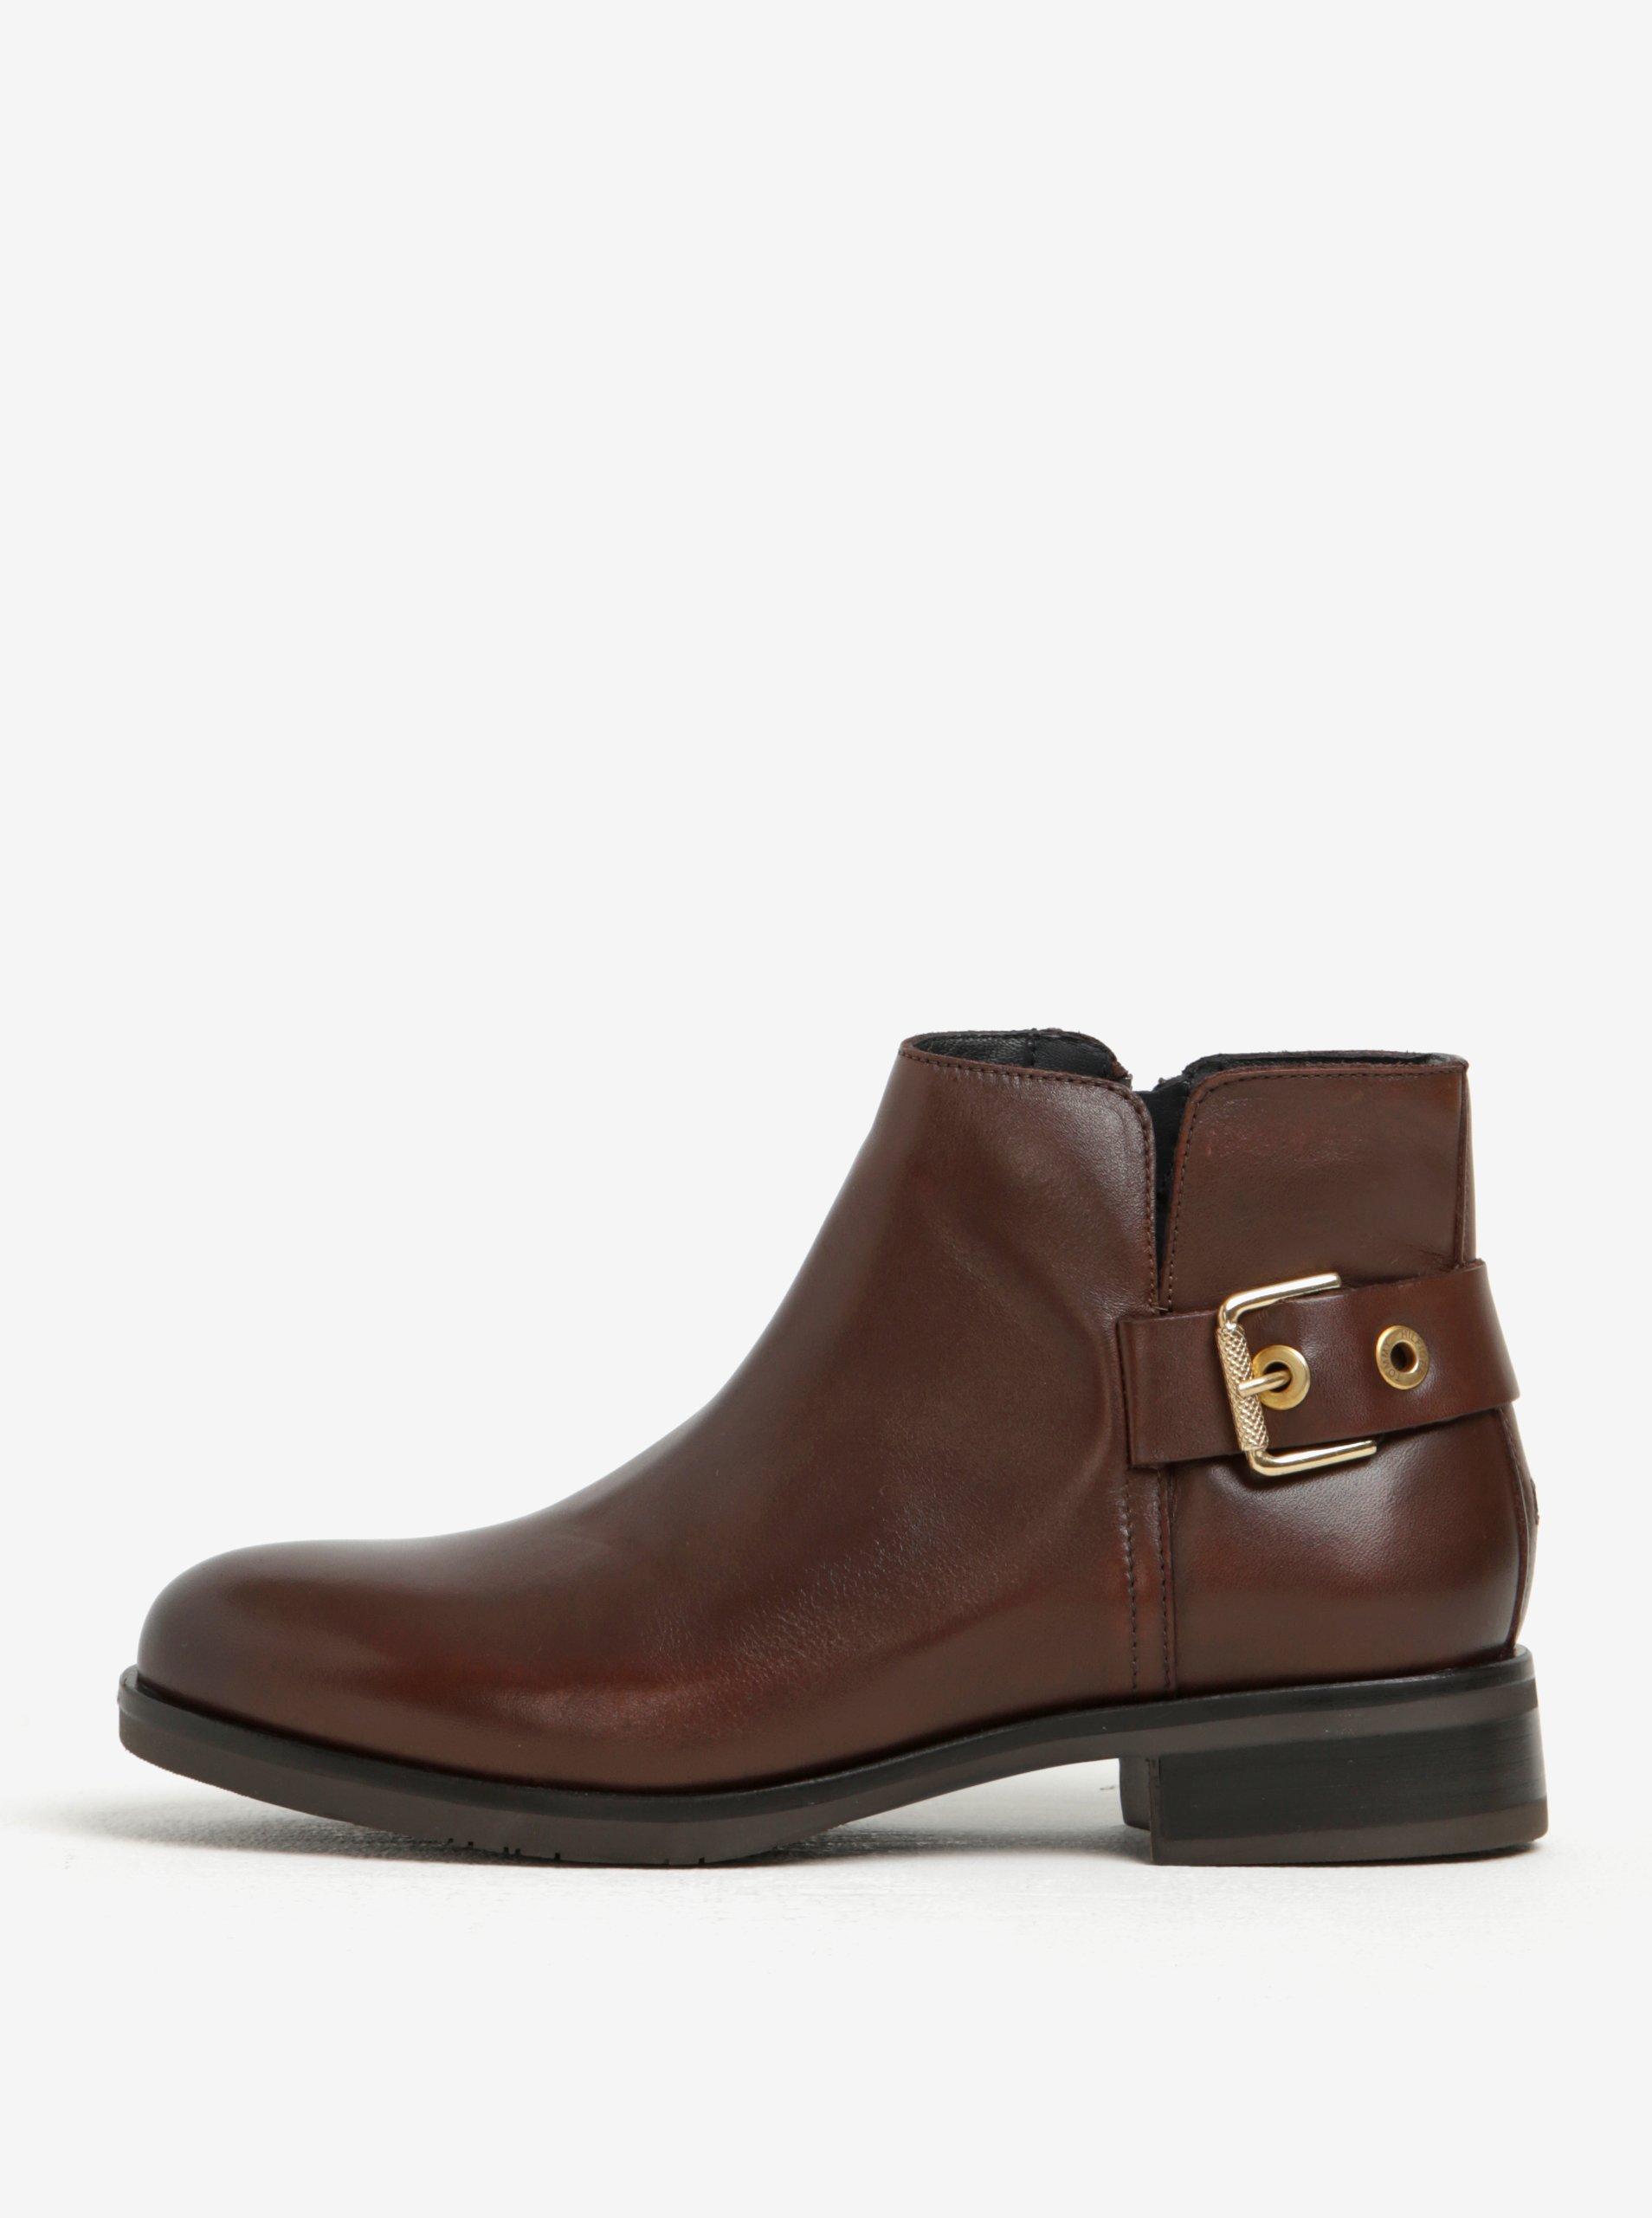 e4532727e5 Tmavohnedé dámske kožené členkové topánky s prackou Tommy Hilfiger ...